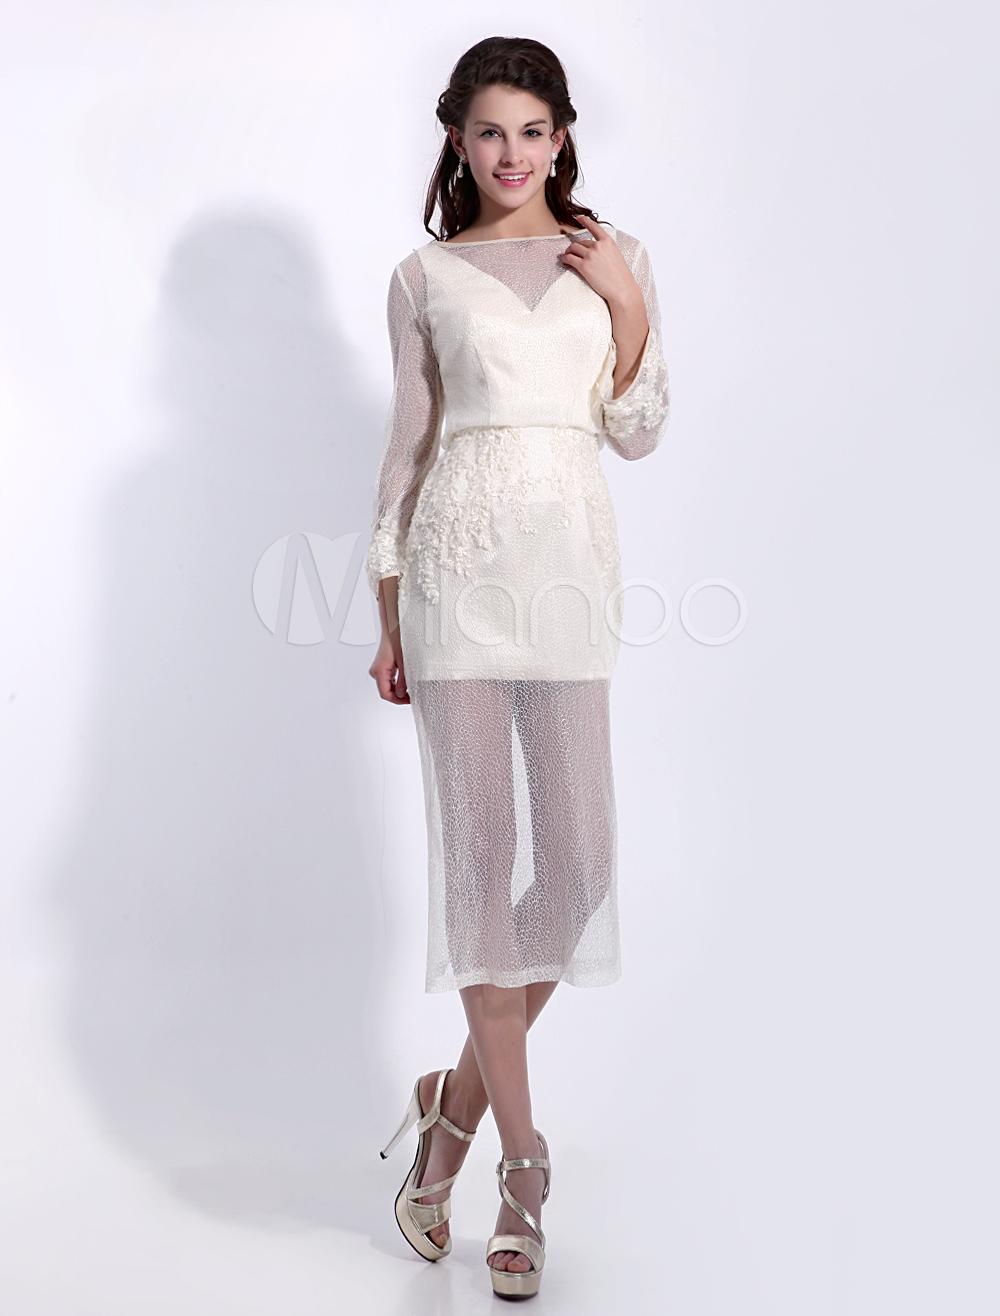 Pretty Sheath Jewel Neck Beading Long Sleeves Tulle Cocktail Dress Milanoo (Wedding Cocktail Dresses) photo